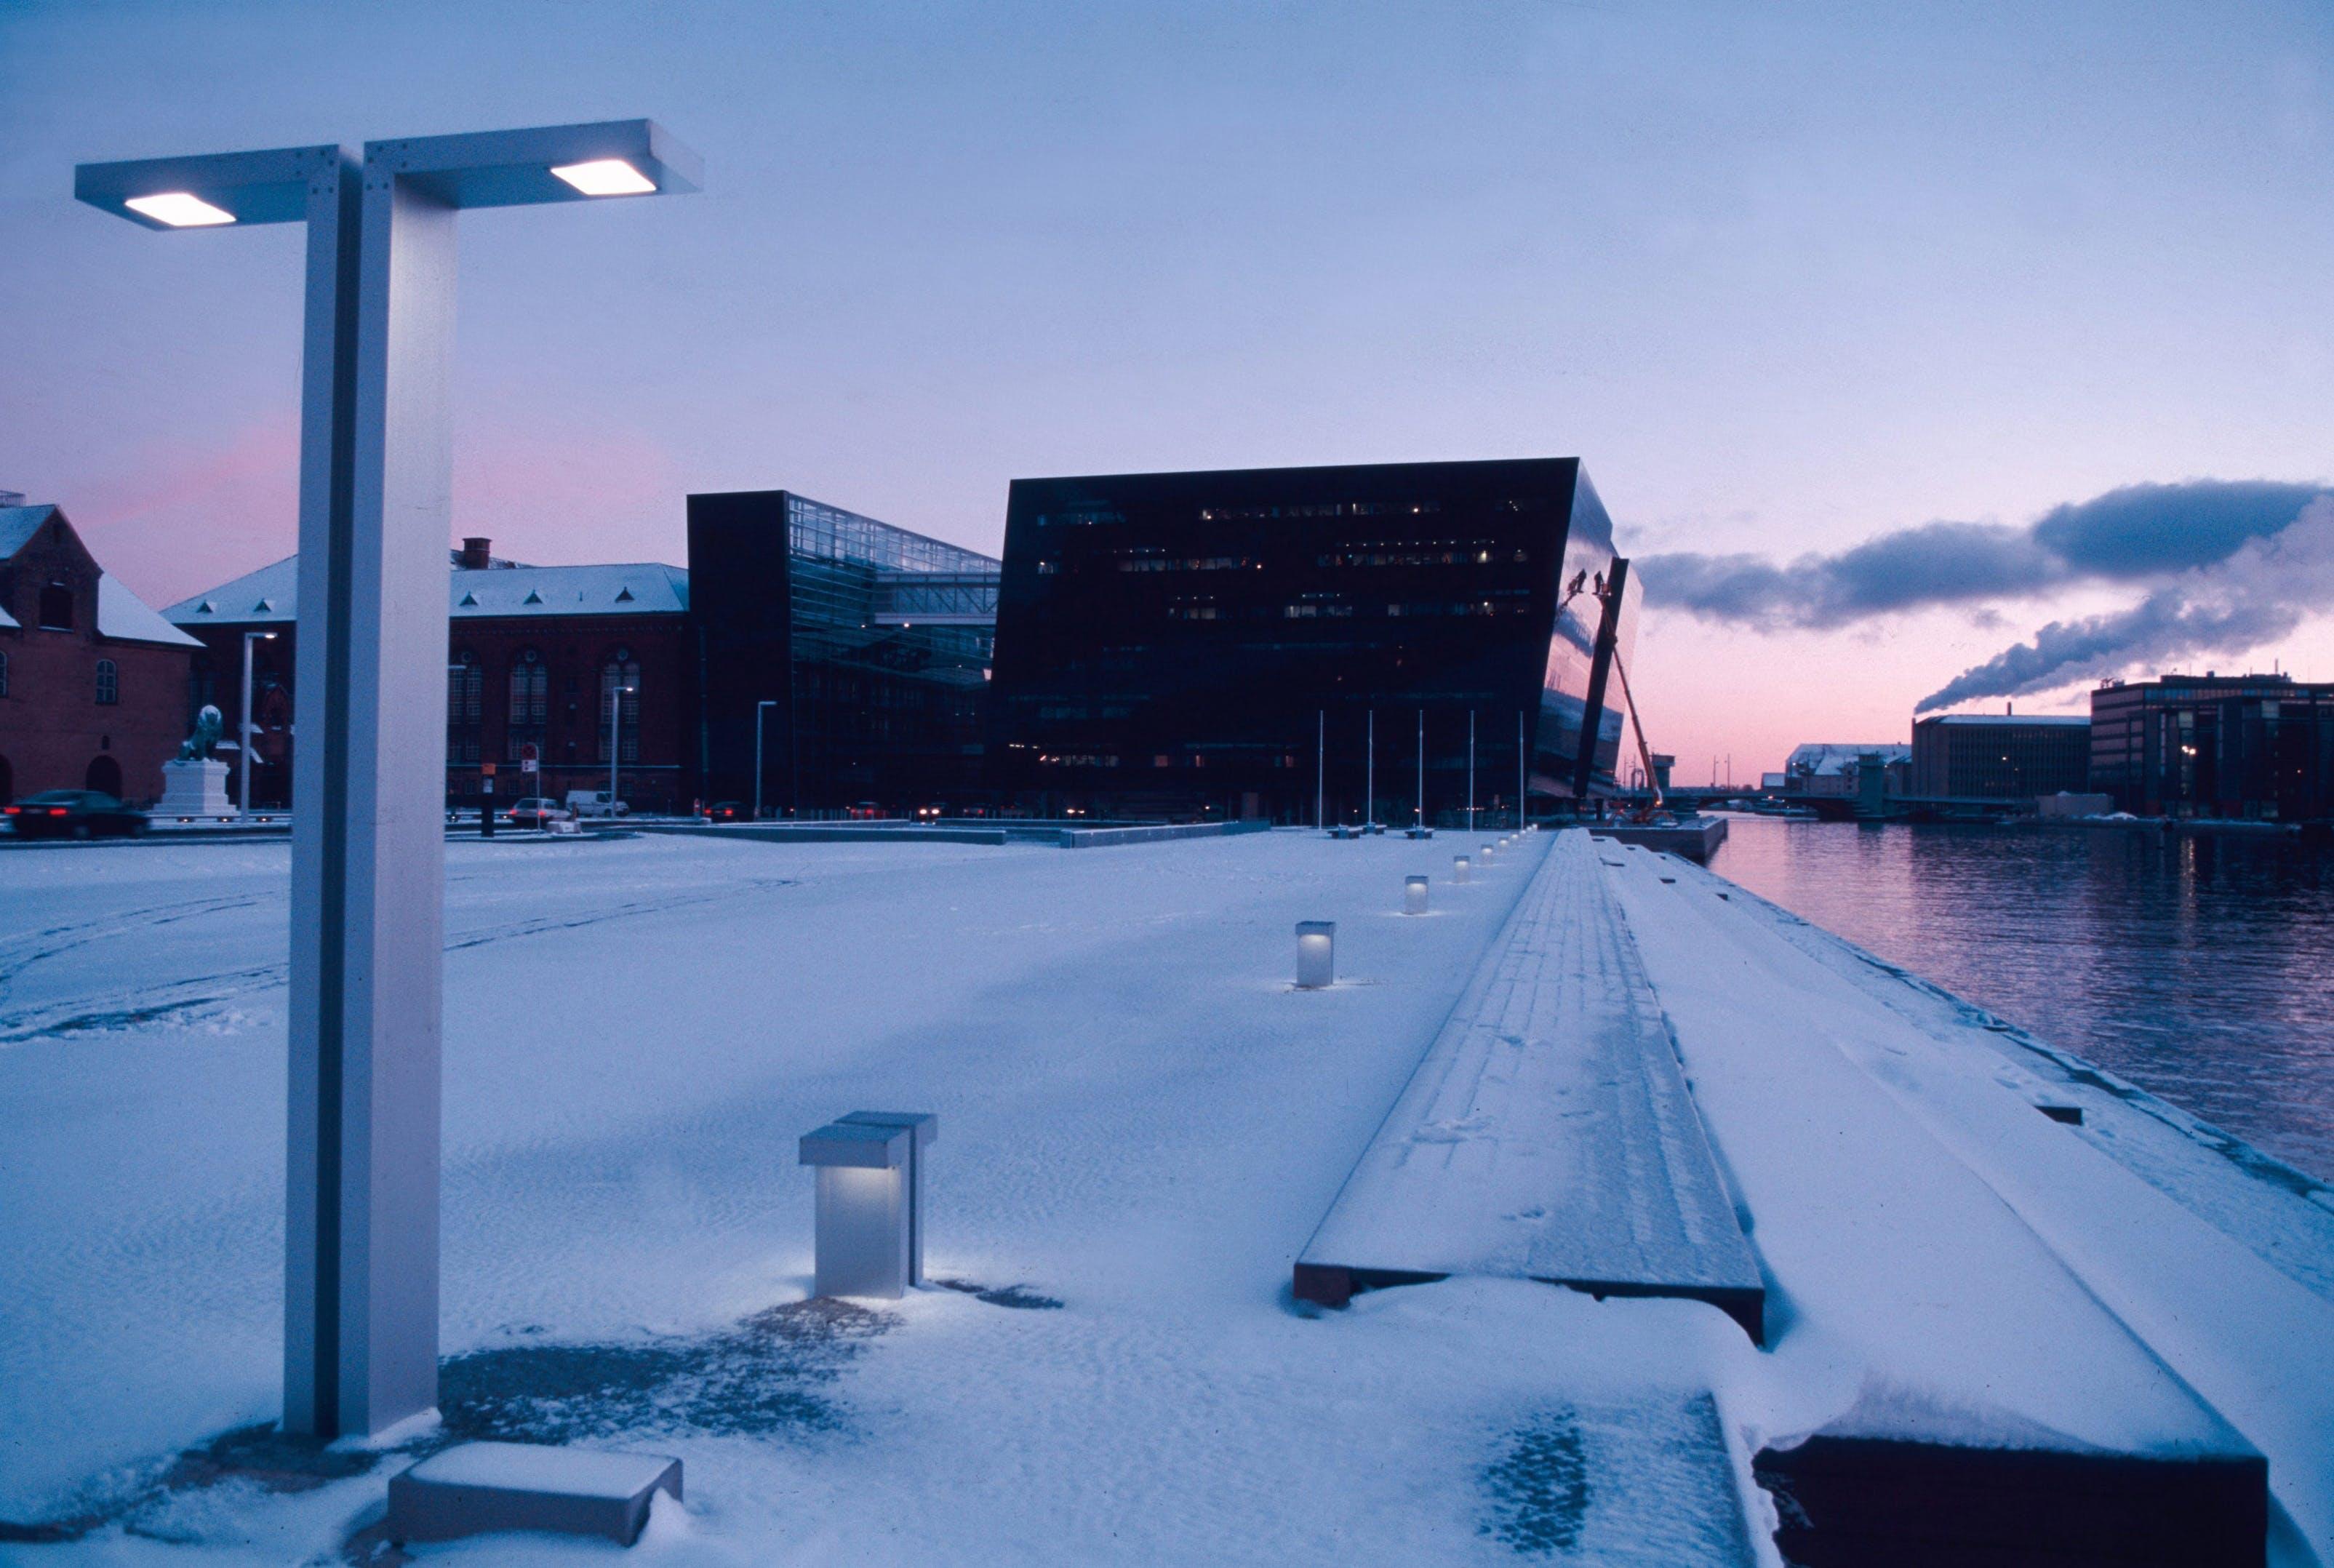 arkitektur guide københavn den sorte diamant den kongelige bibliotek